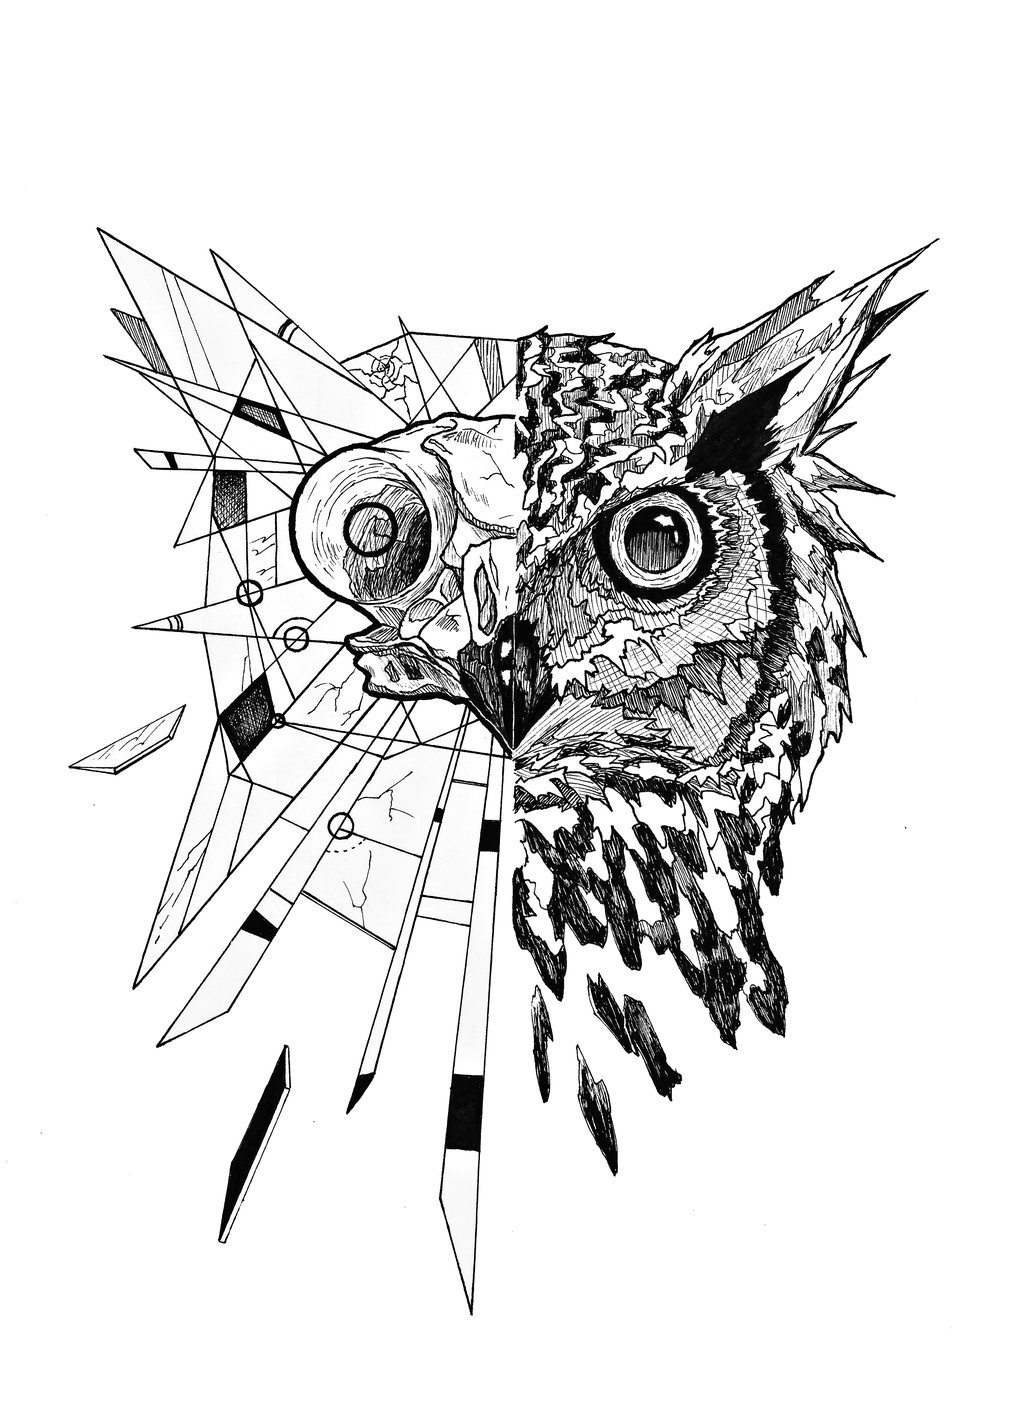 Impressive half-geometric owl tattoo design by Junbenliesor